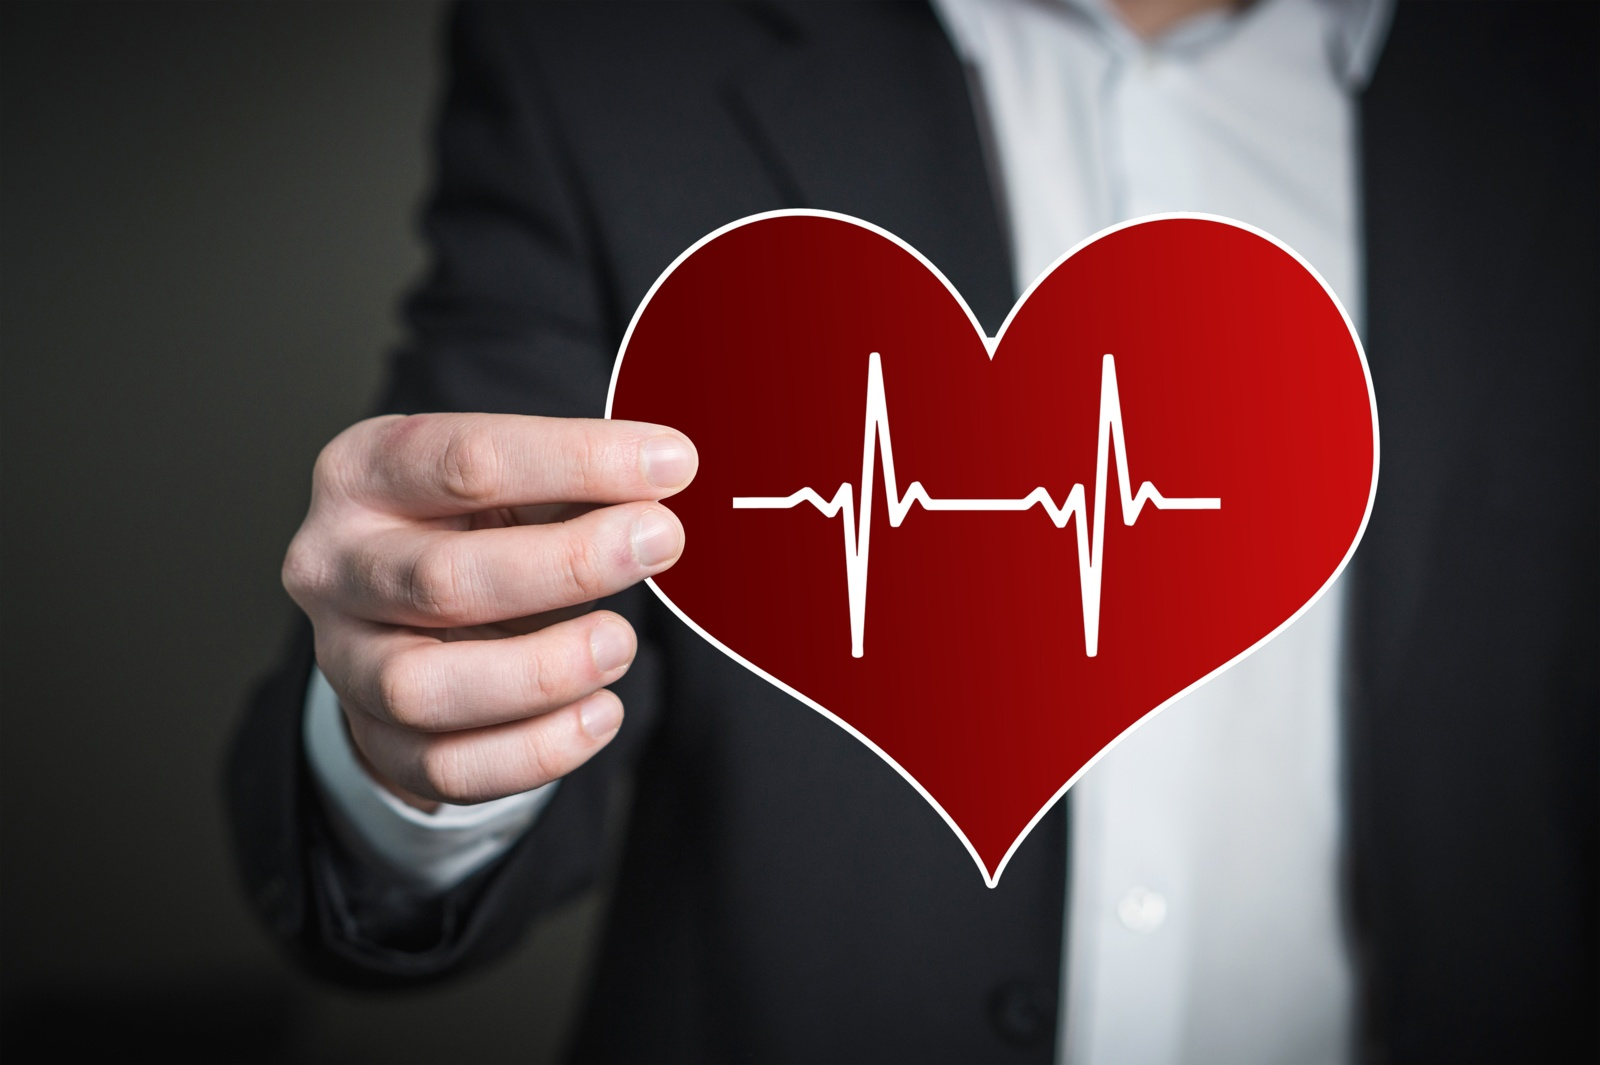 kaip baseinas veikia hipertenziją hipertenzija su prostatitu